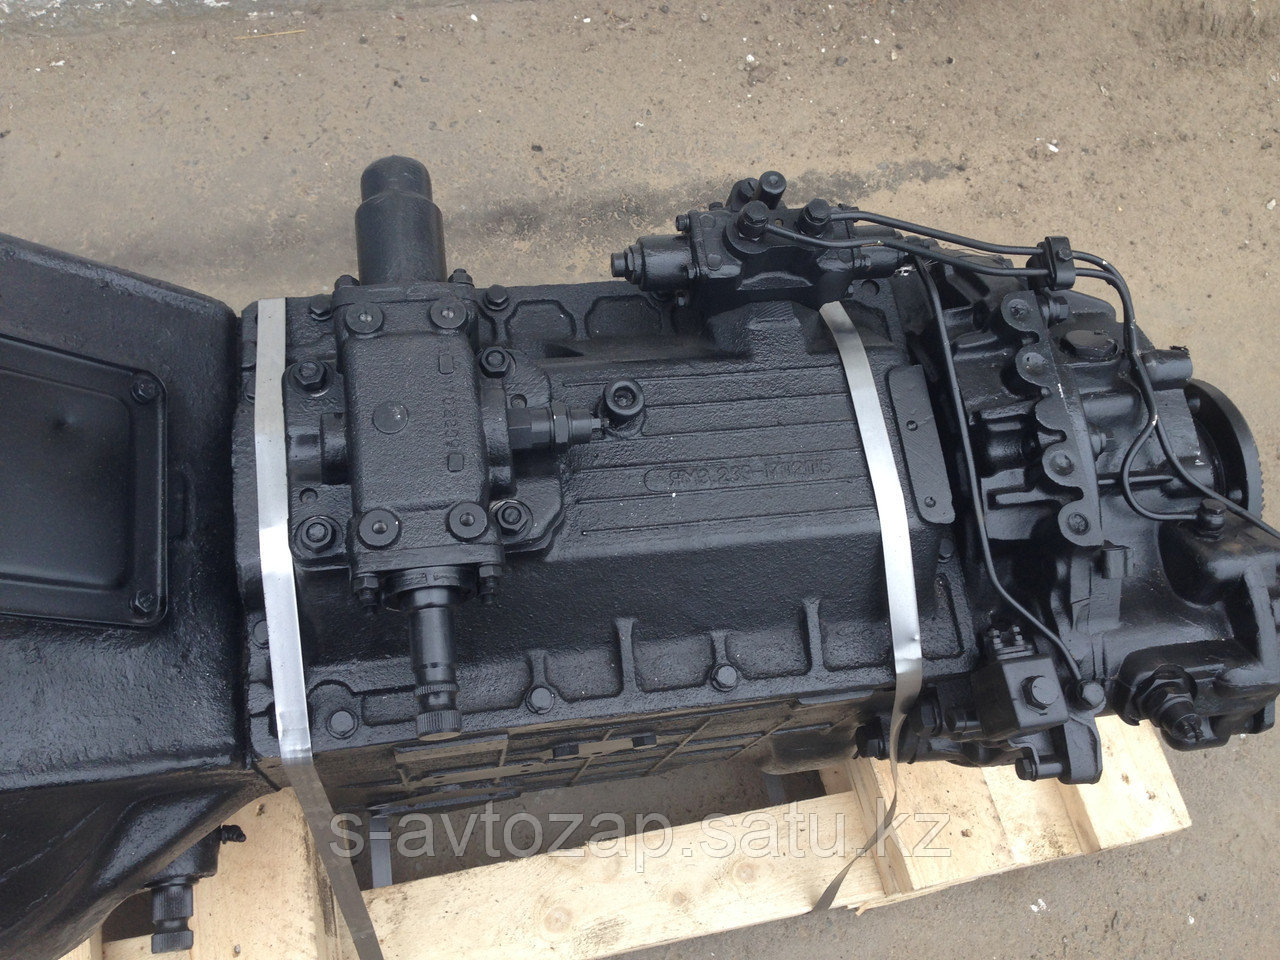 Коробка переключения передач для двигателя ЯМЗ 239-1700025-09